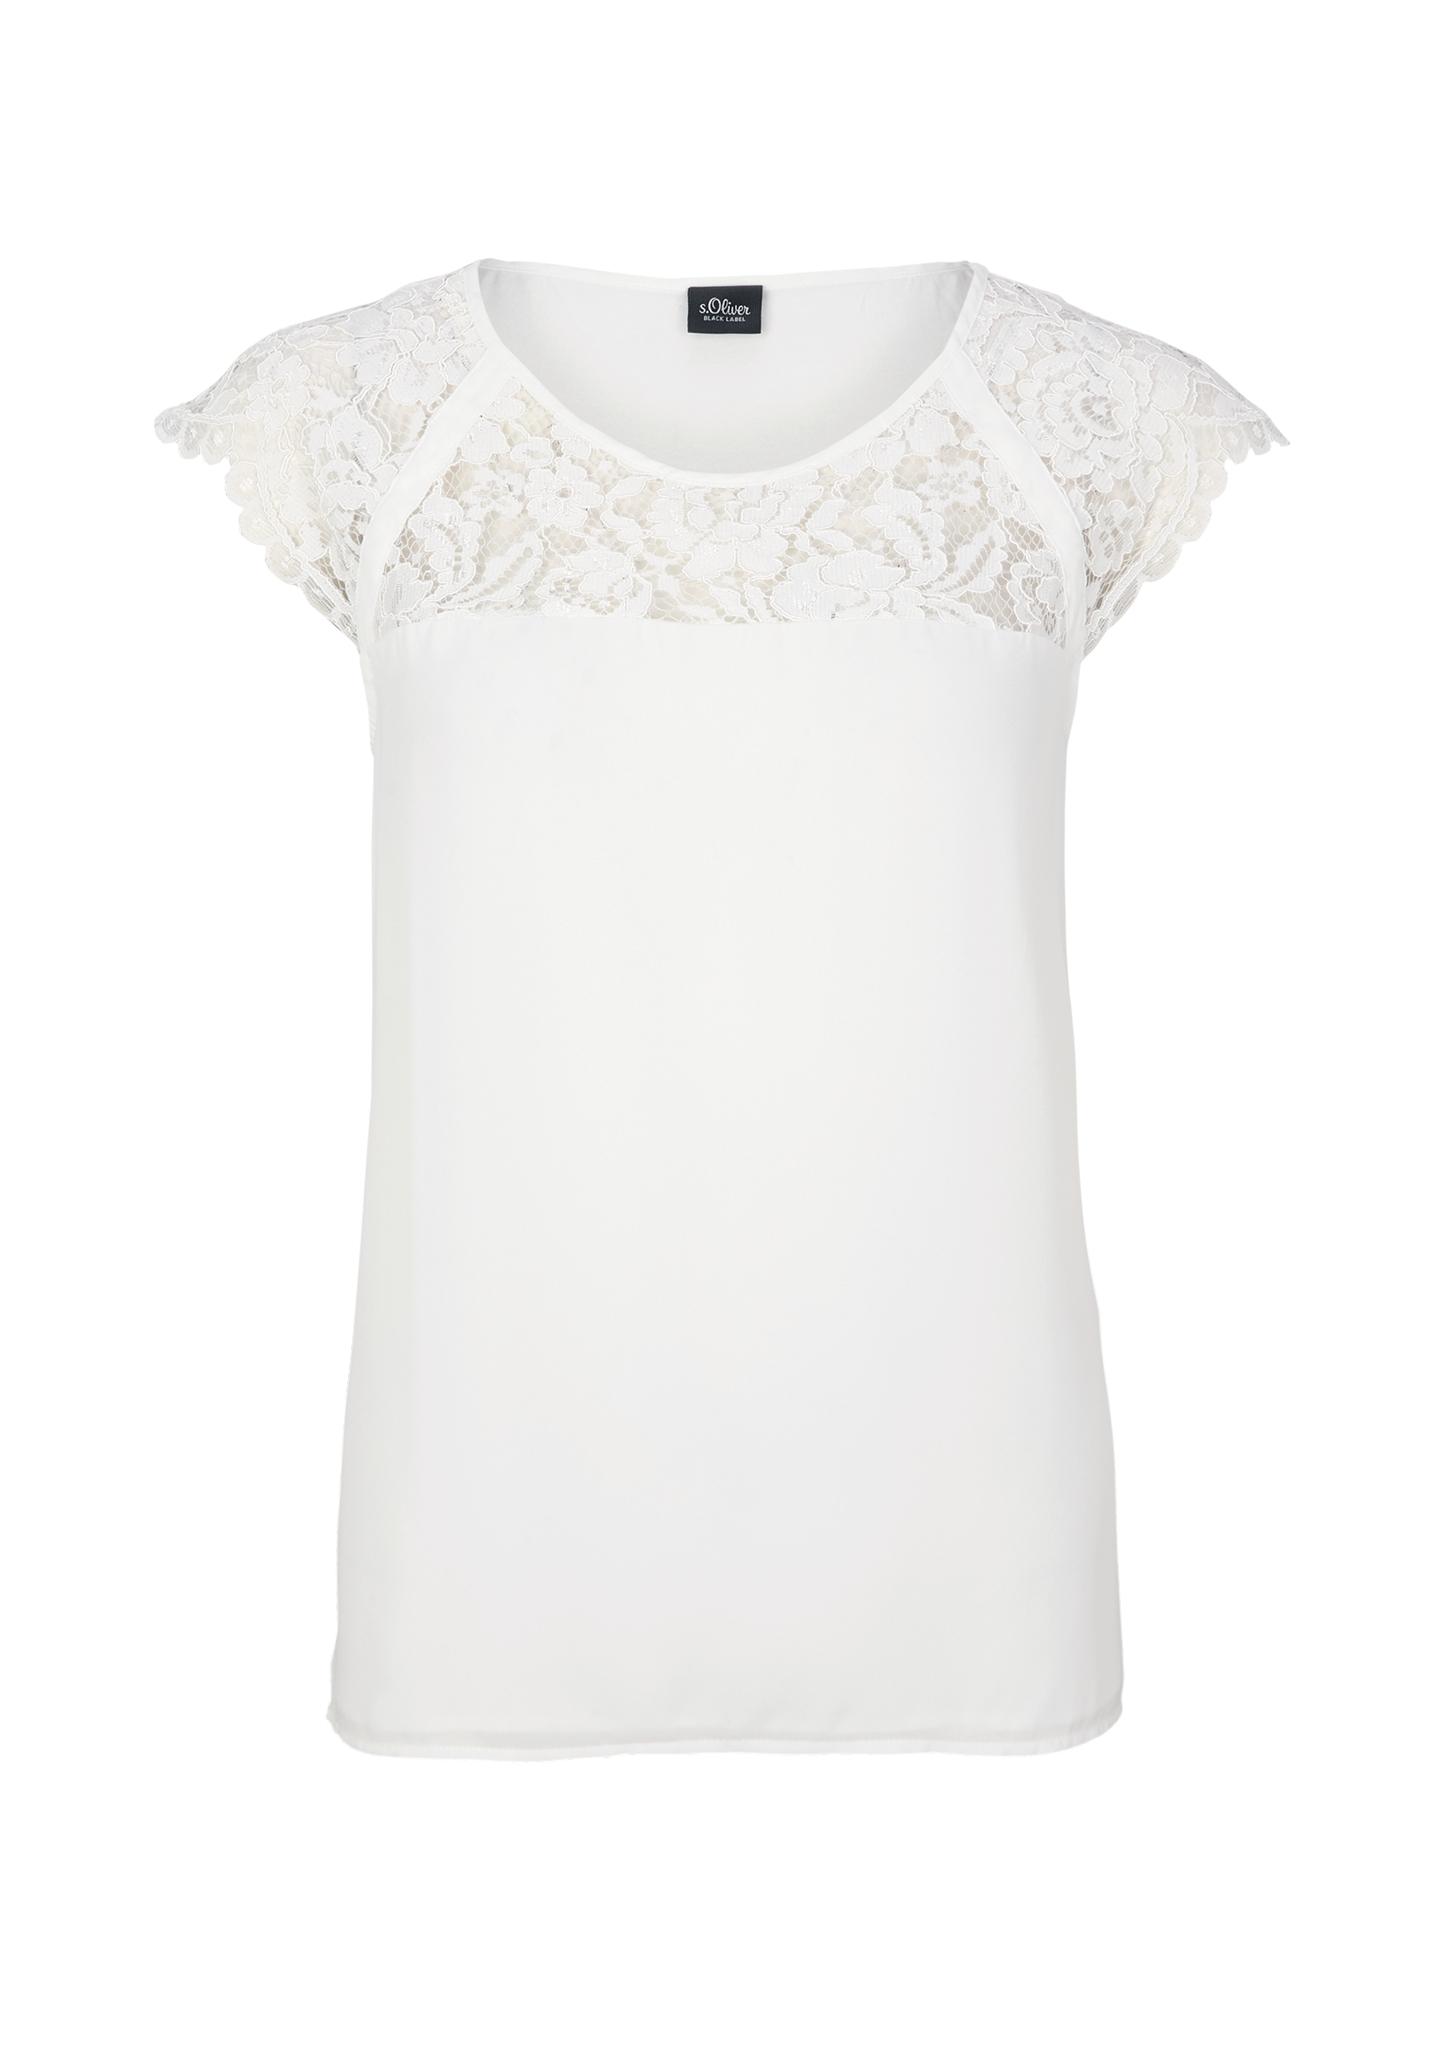 Spitzenshirt | Bekleidung > Shirts > Spitzenshirts | s.Oliver BLACK LABEL